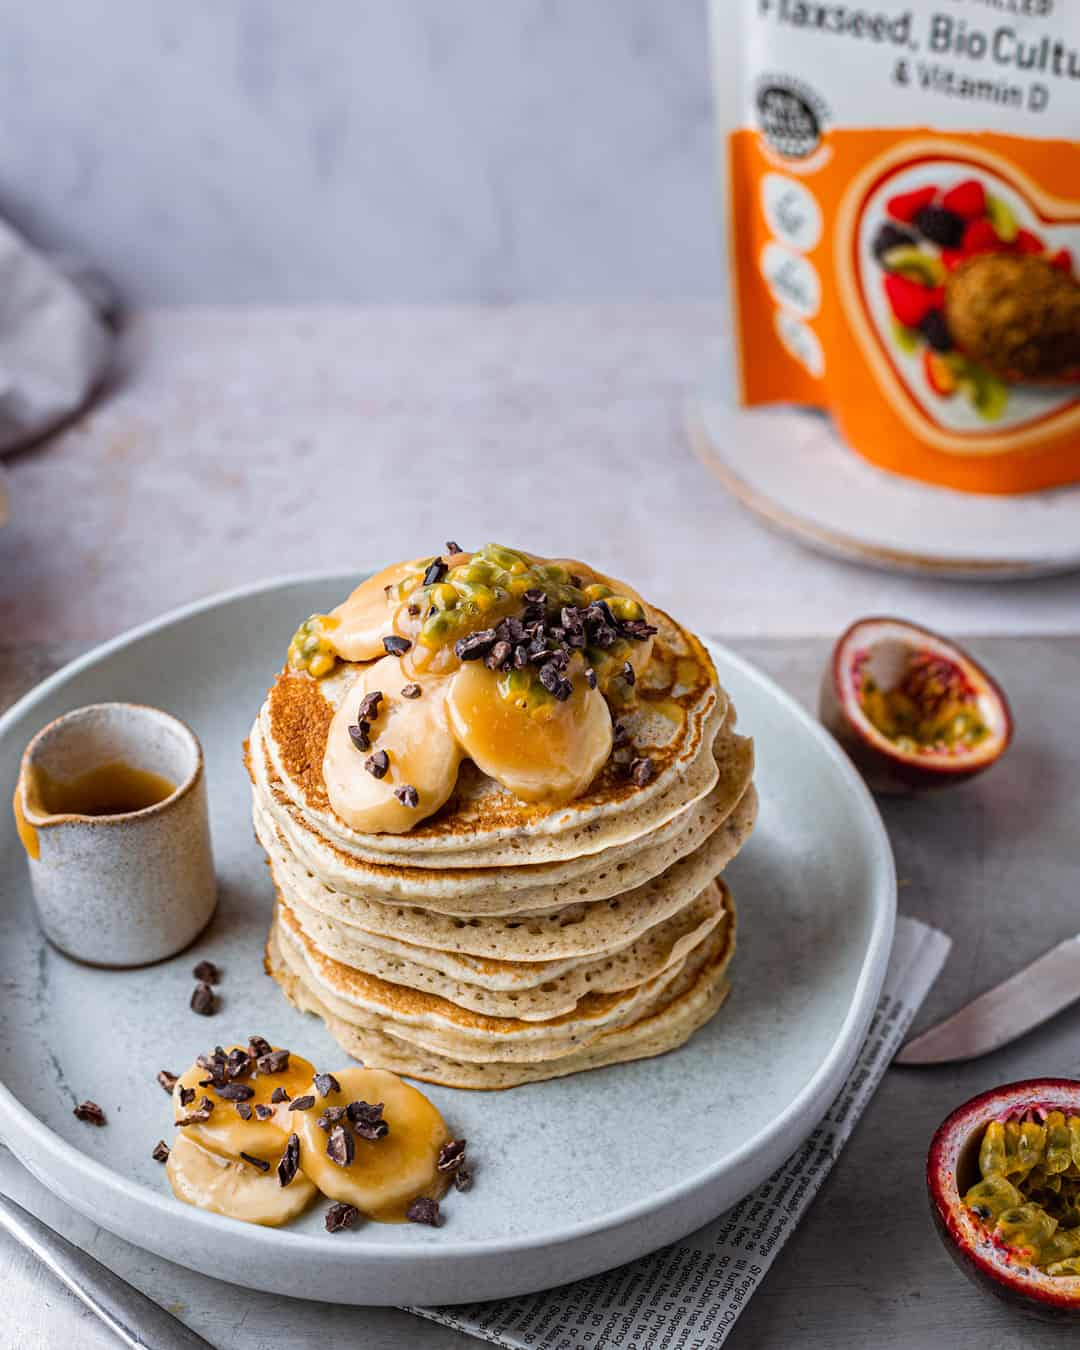 Banana Spelt Flour Flax Pancakes by @peachypalate